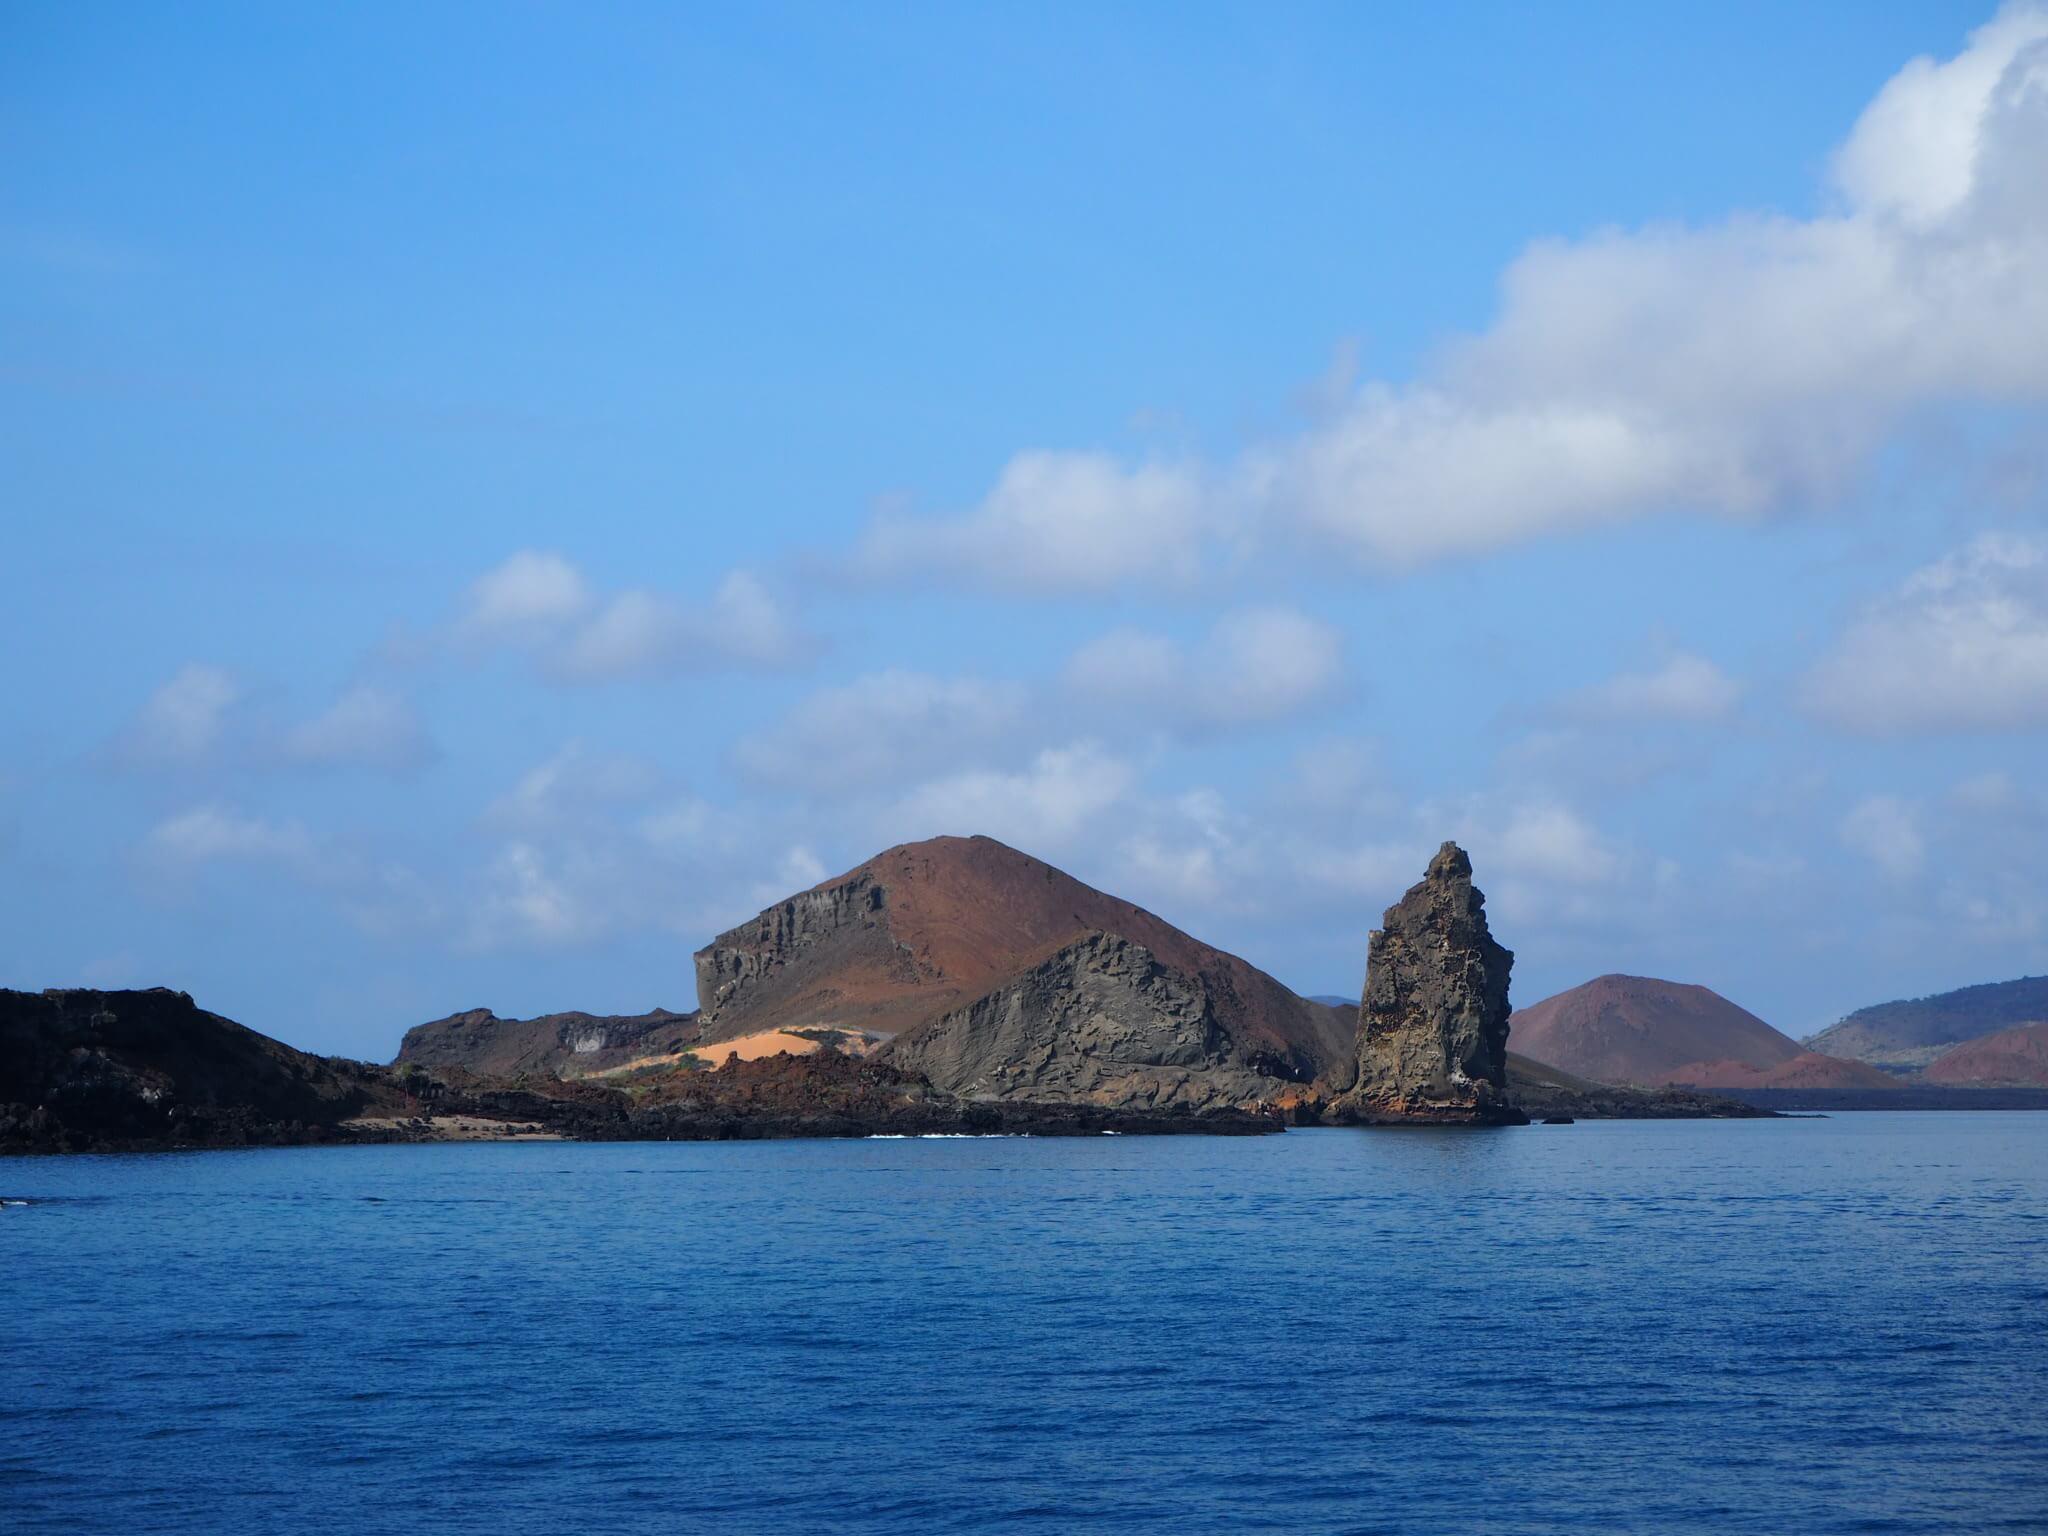 Galapagos crucero buceo